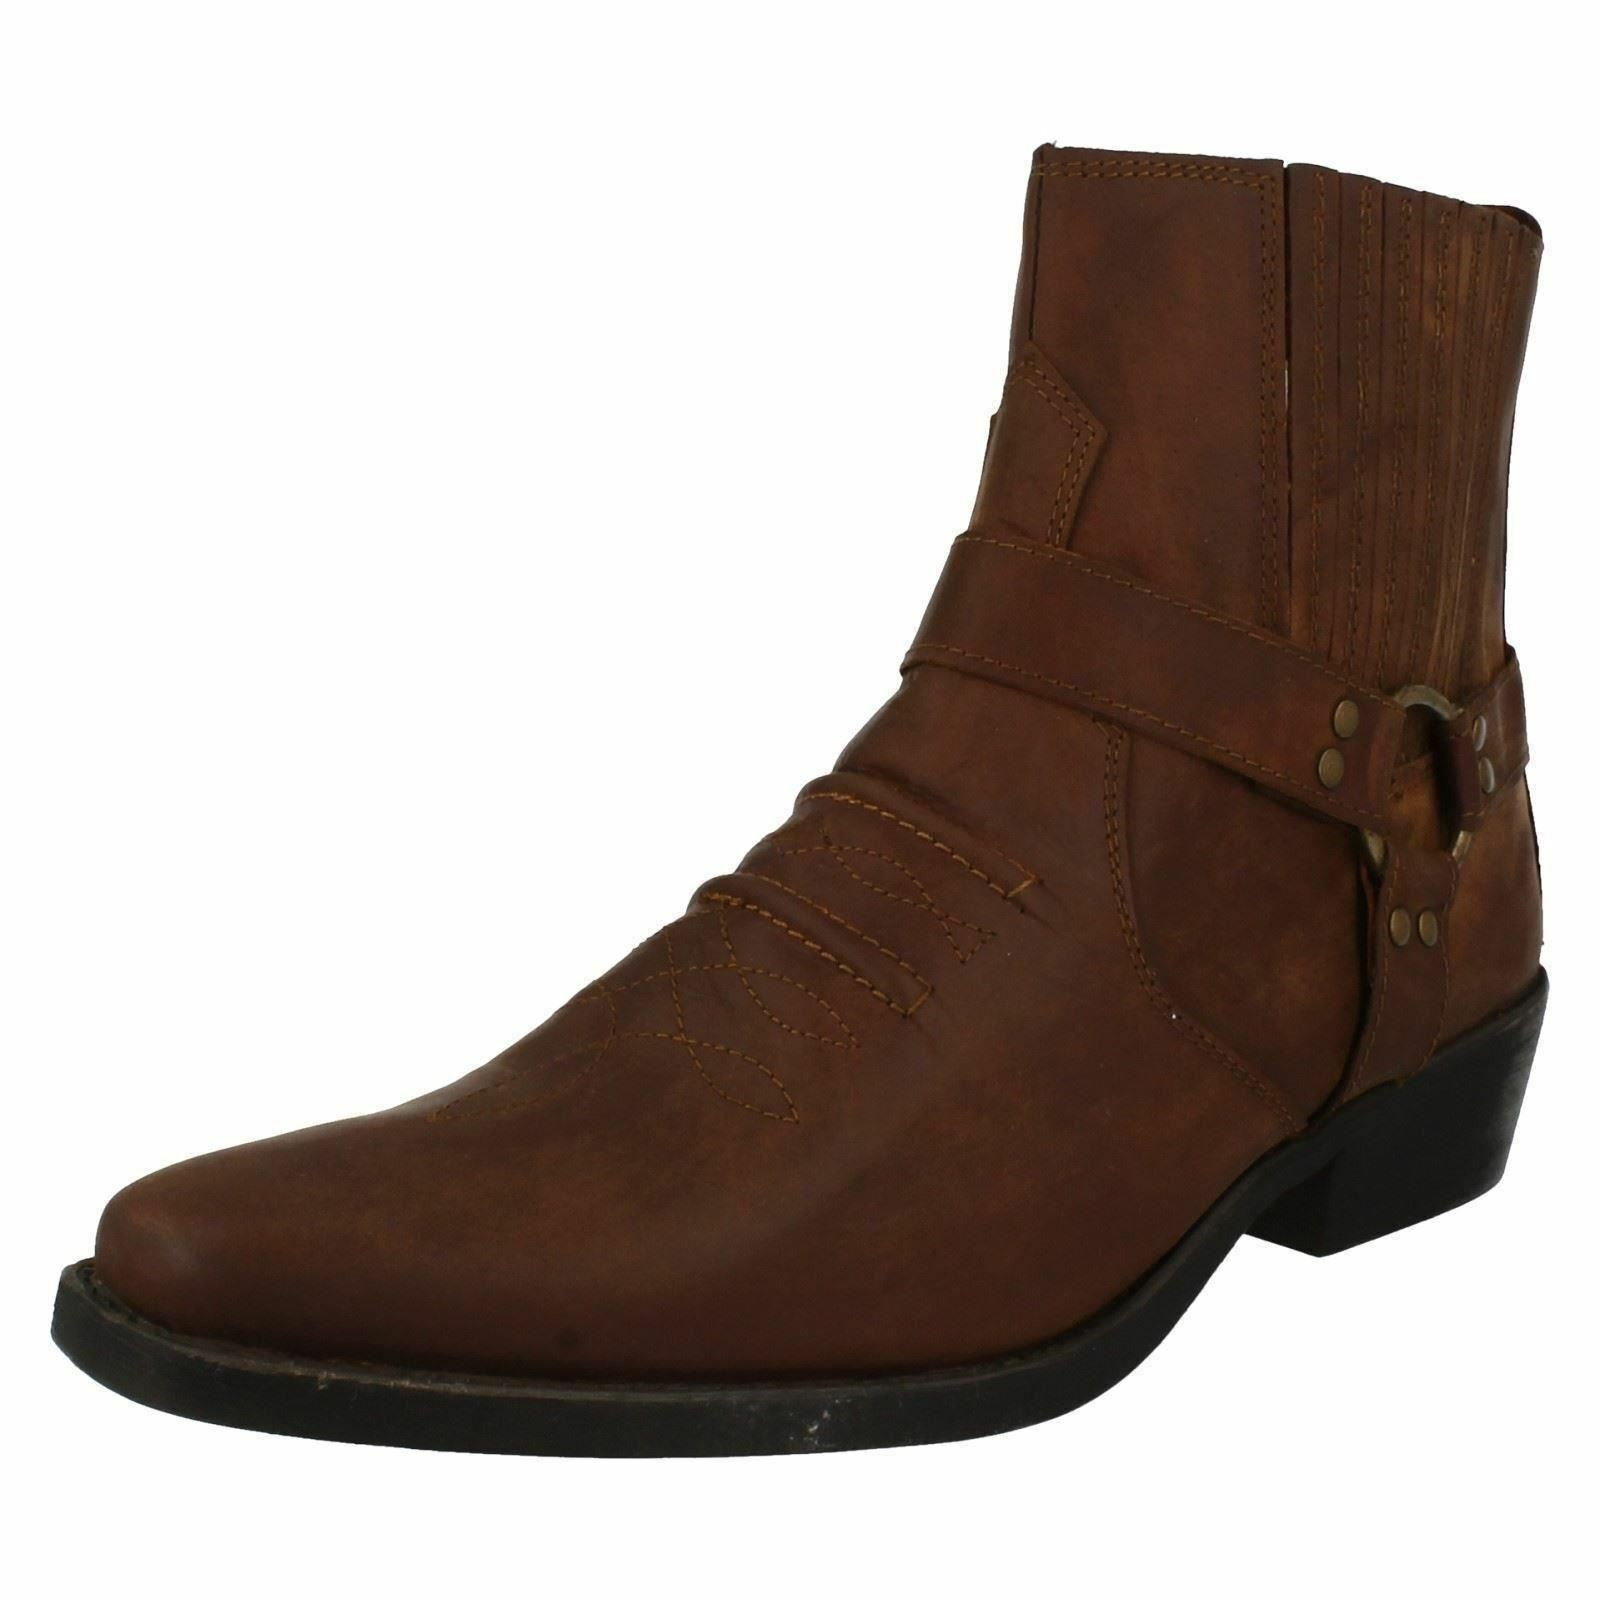 Maverick A3r003 Hombre Marrón Claro 100% Piel Pala Vaquero botas